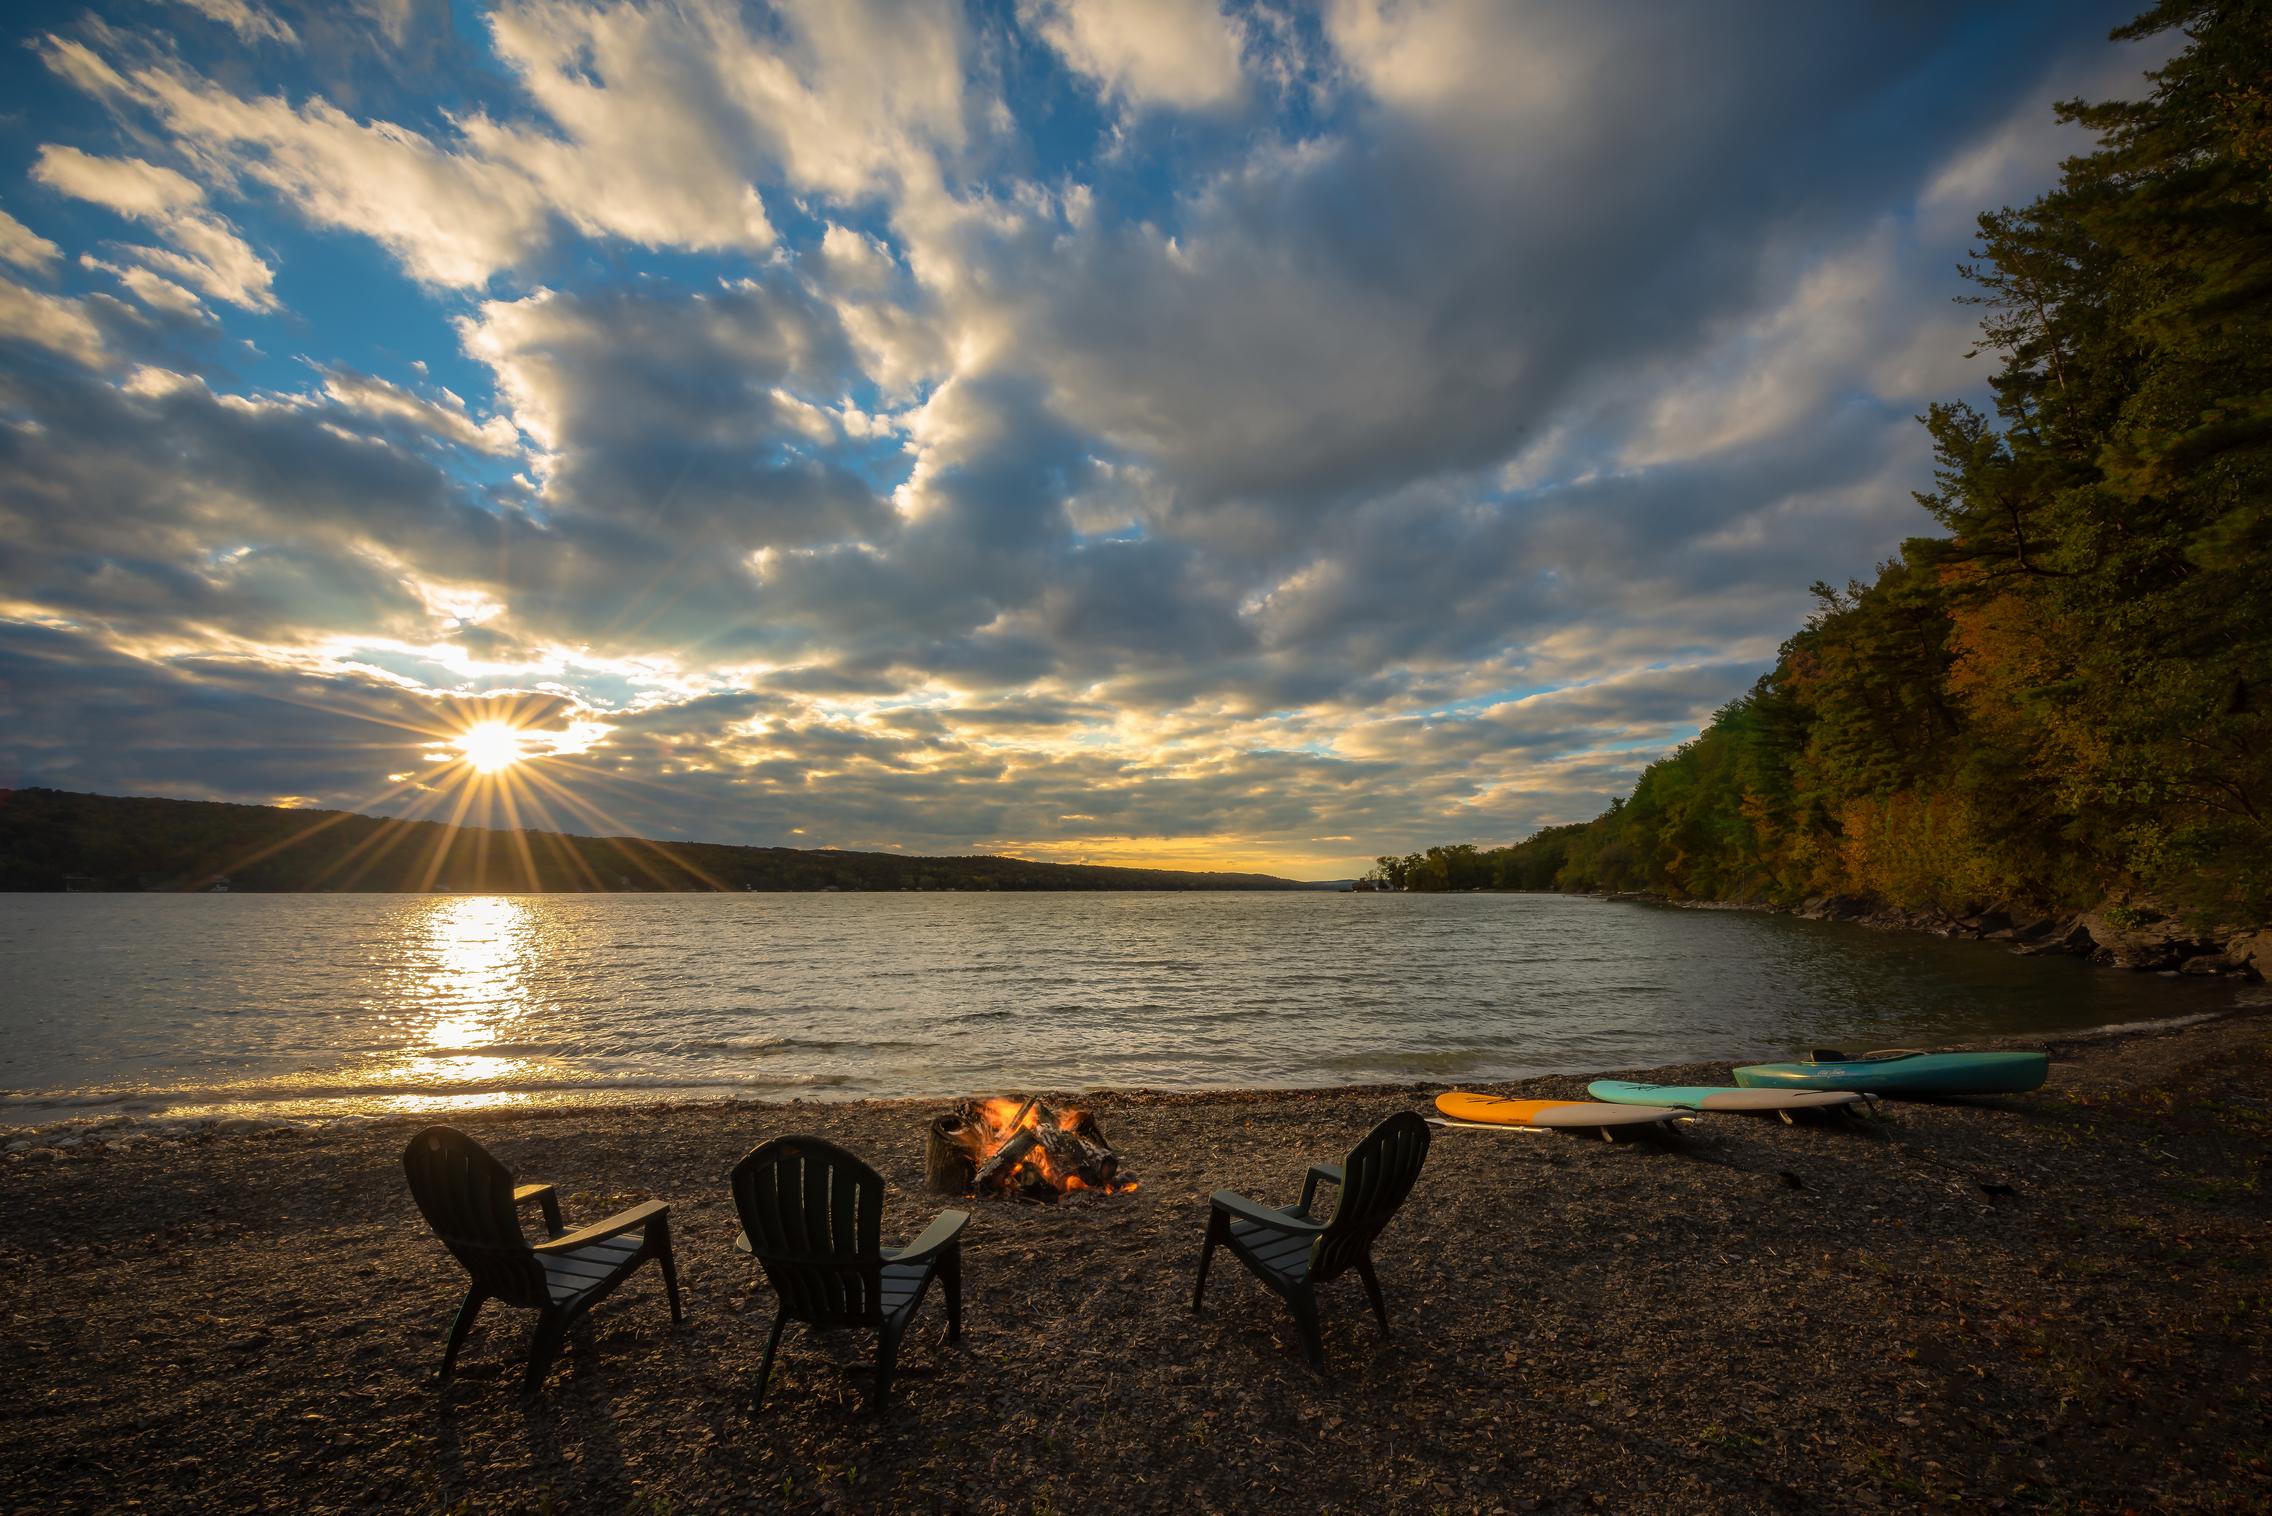 30 Camp Longhorn, 974 Ten Mile Point, Skaneateles, NY 13152, For Sale Michael DeRosa listings.JPG